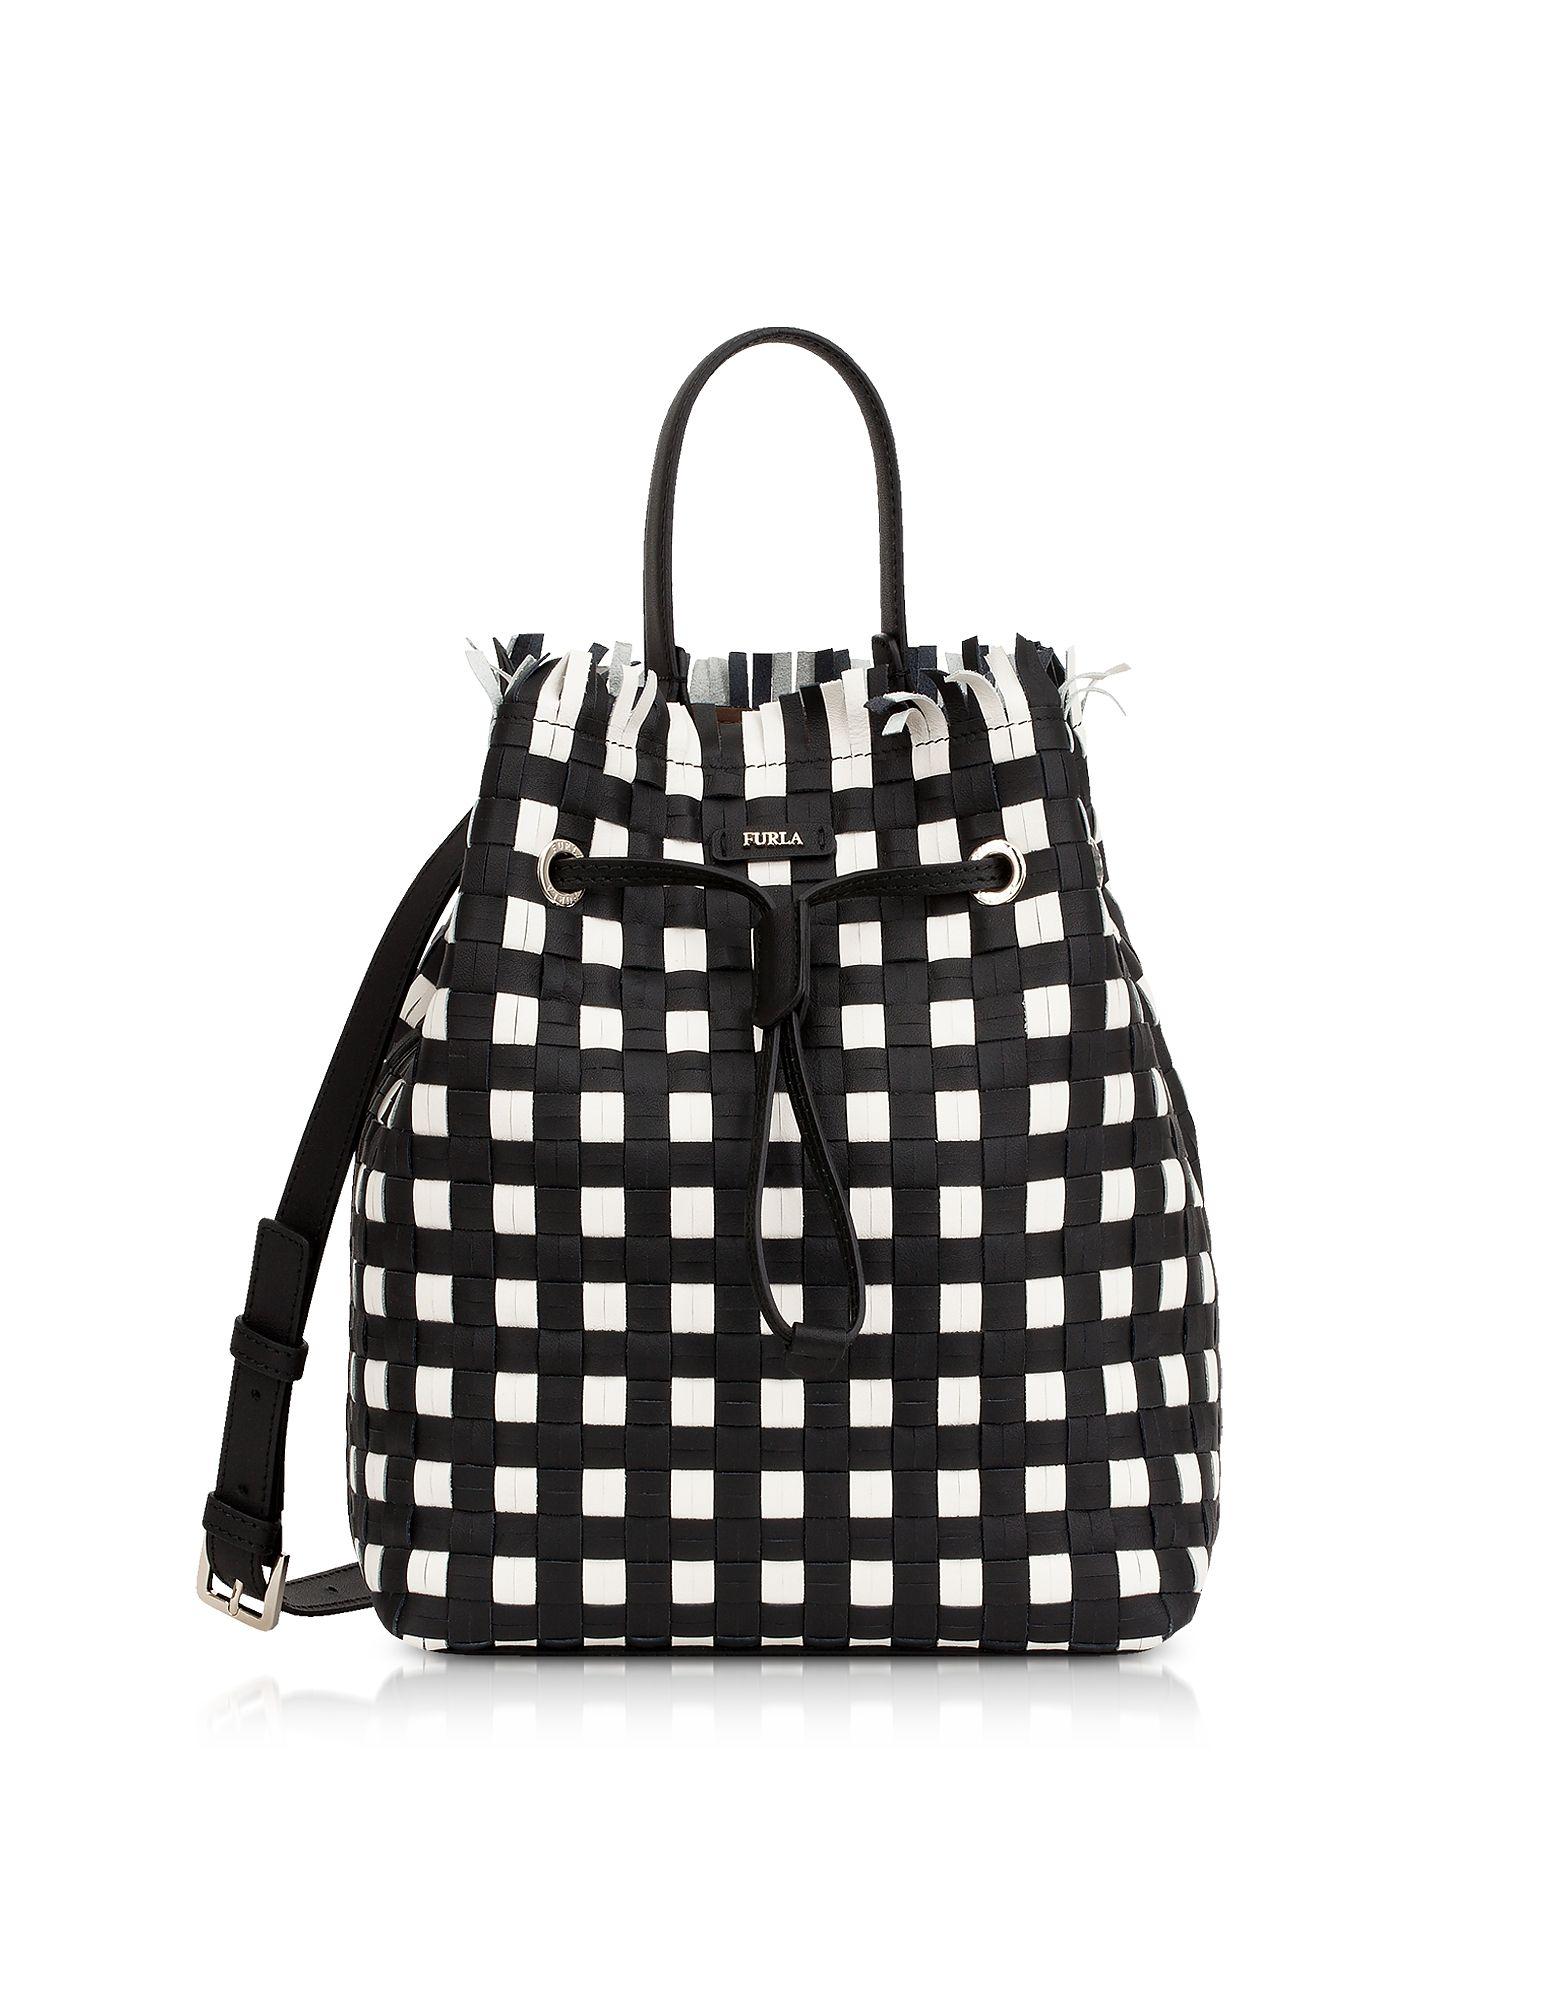 Furla Stacy Casanova Bucket Bag s Onyx Outlet Cost Sale Discount Footlocker Finishline For Sale kxRFUbZ